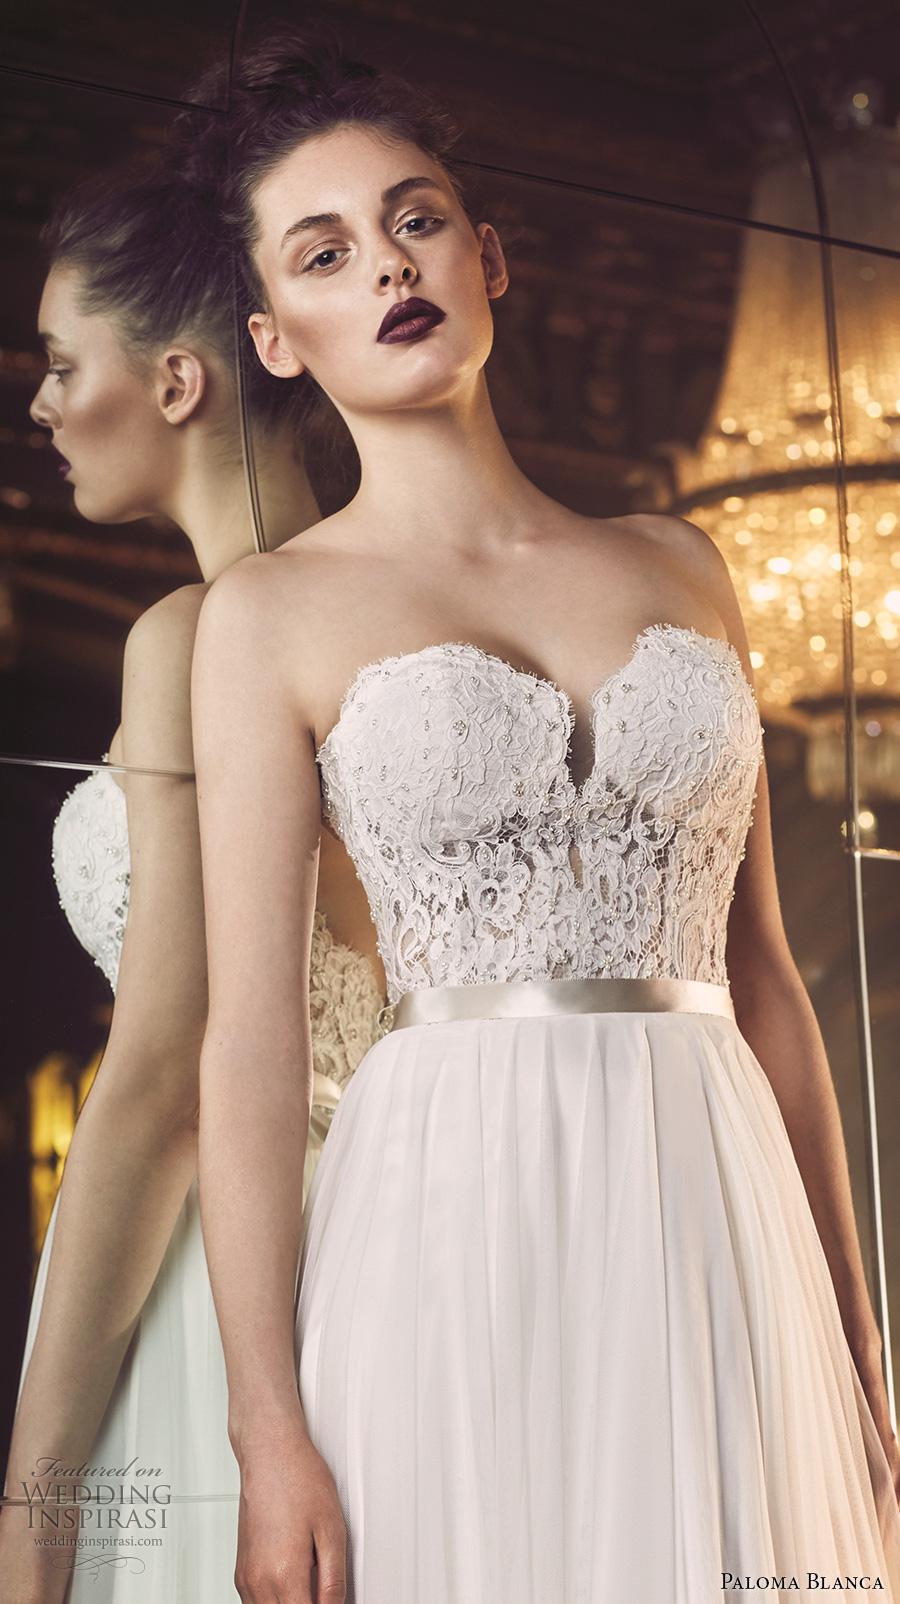 Paloma Blanca Wedding Dresses For Sale 51 Vintage paloma blanca fall bridal